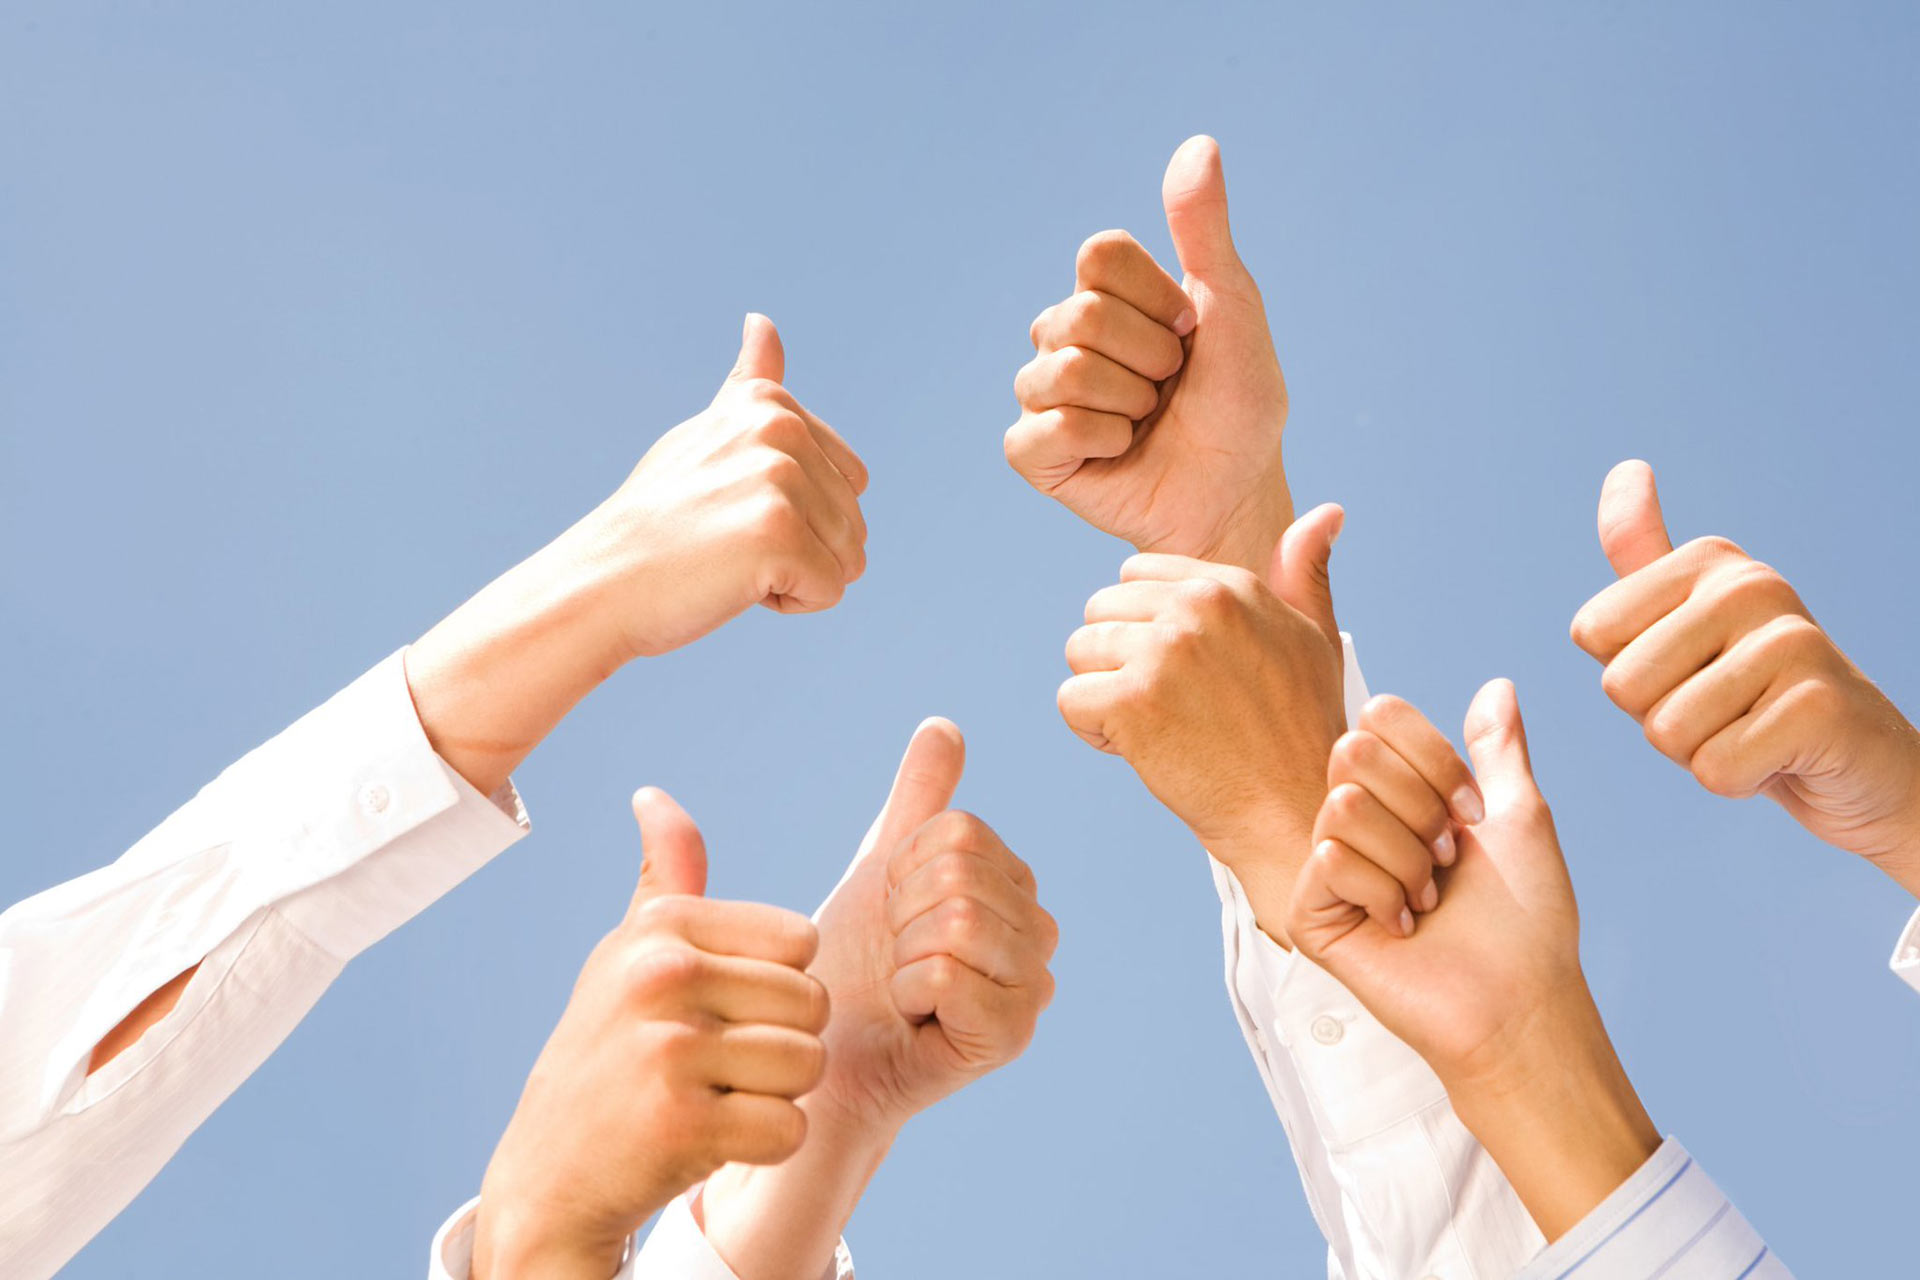 Вебинар: Как научиться оптимизму и самомотивации?